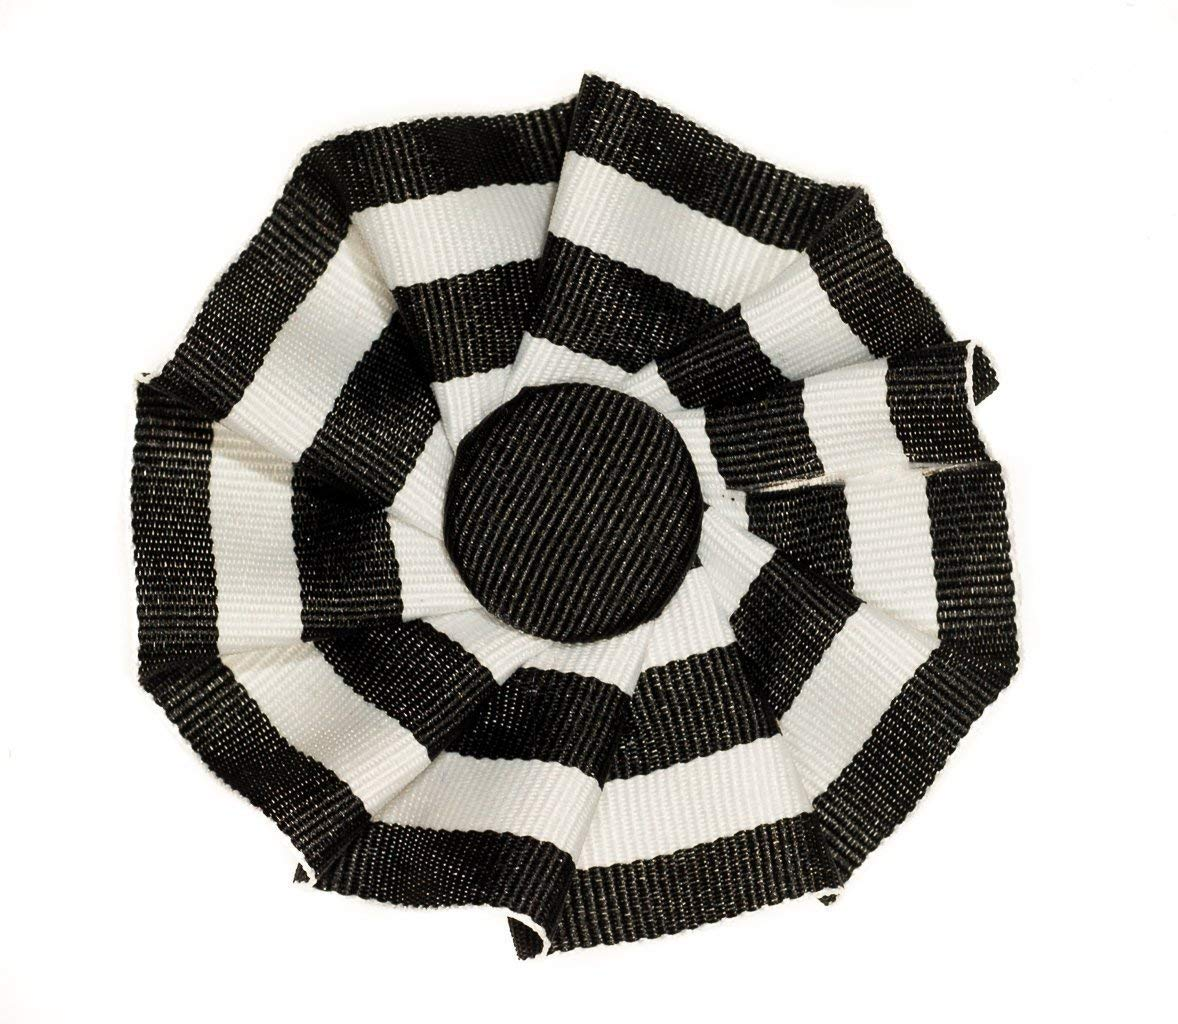 Federalist Ribbon Cockade Black White Stripe Hat Trim with Brooch Pin Back